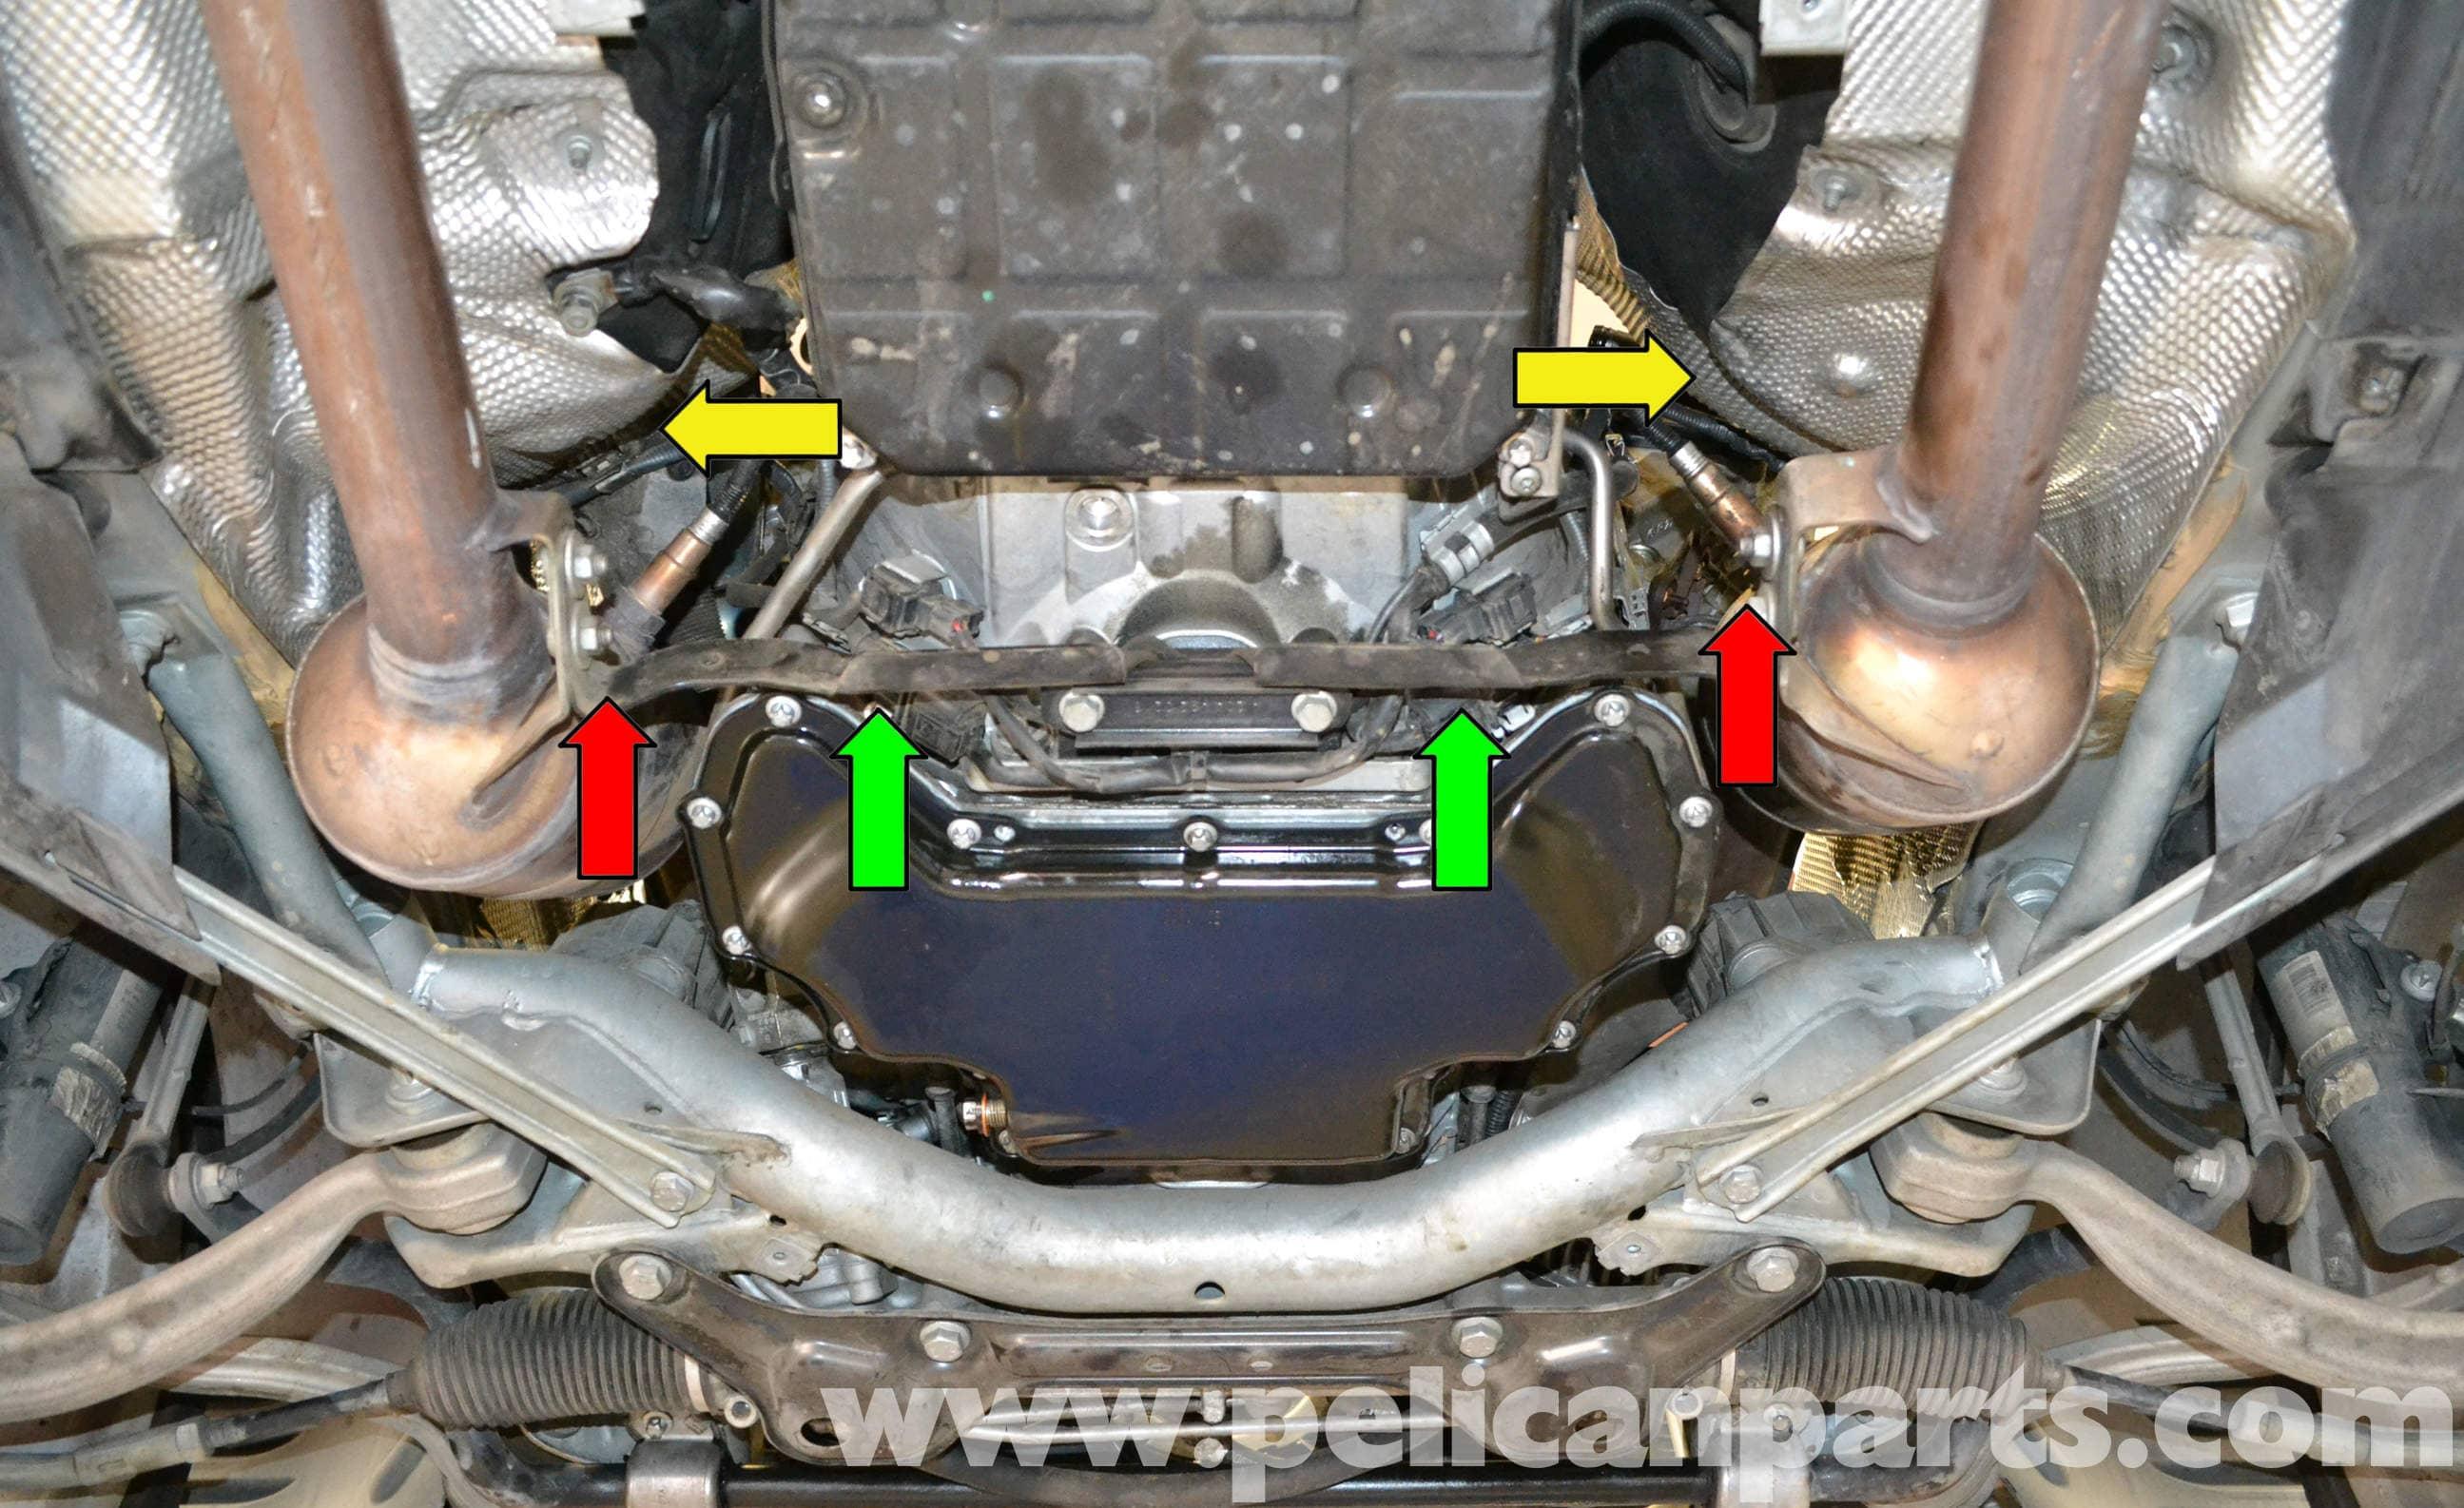 Mercedes benz w204 oxygen sensor replacement 2008 2014 for Mercedes benz sensors